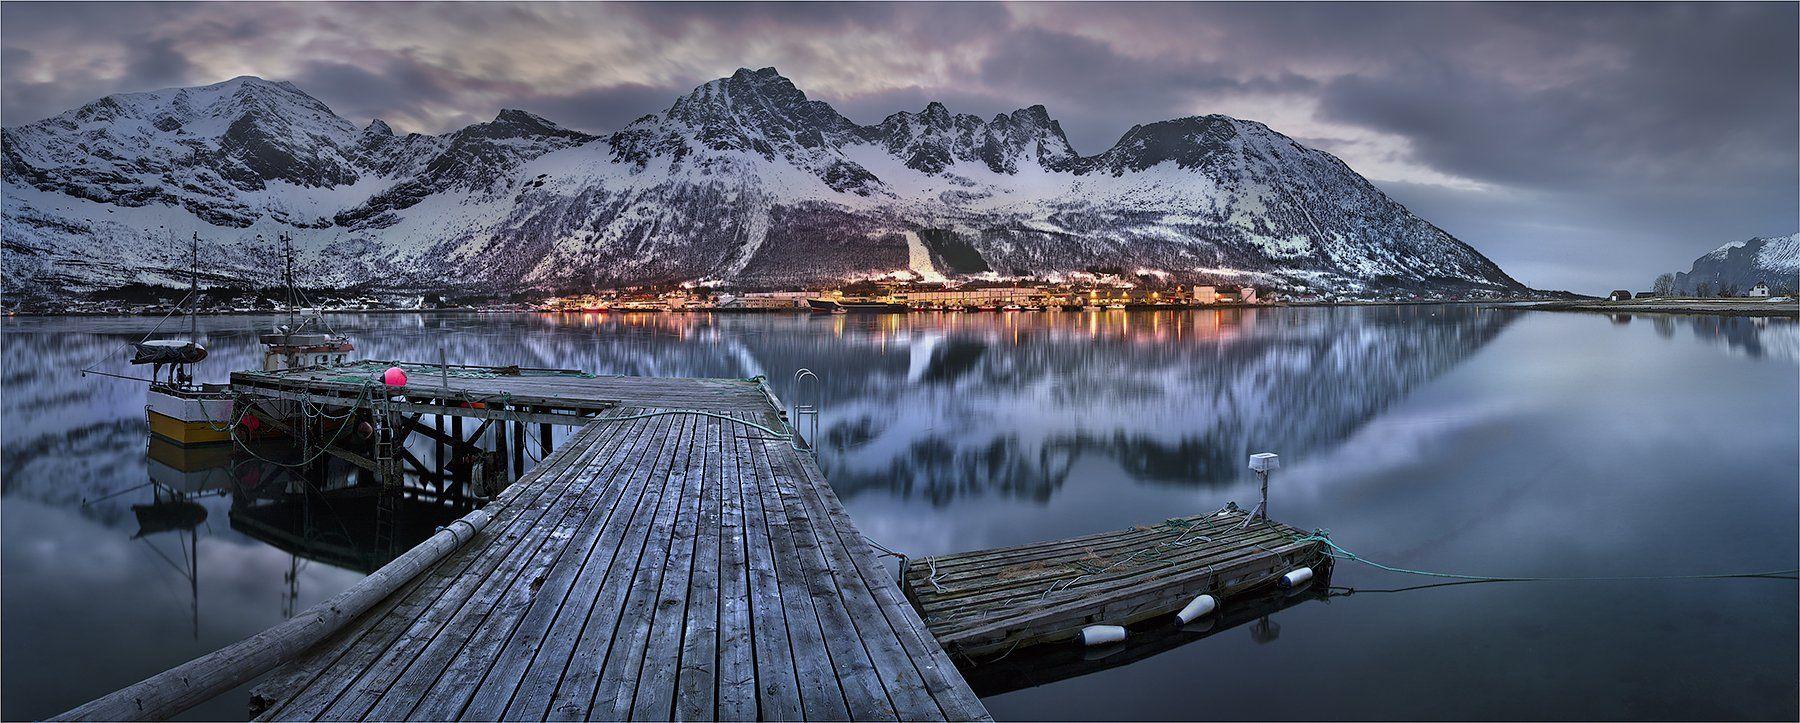 норвегия, Yury Pustovoy (artphoto-tour.com)